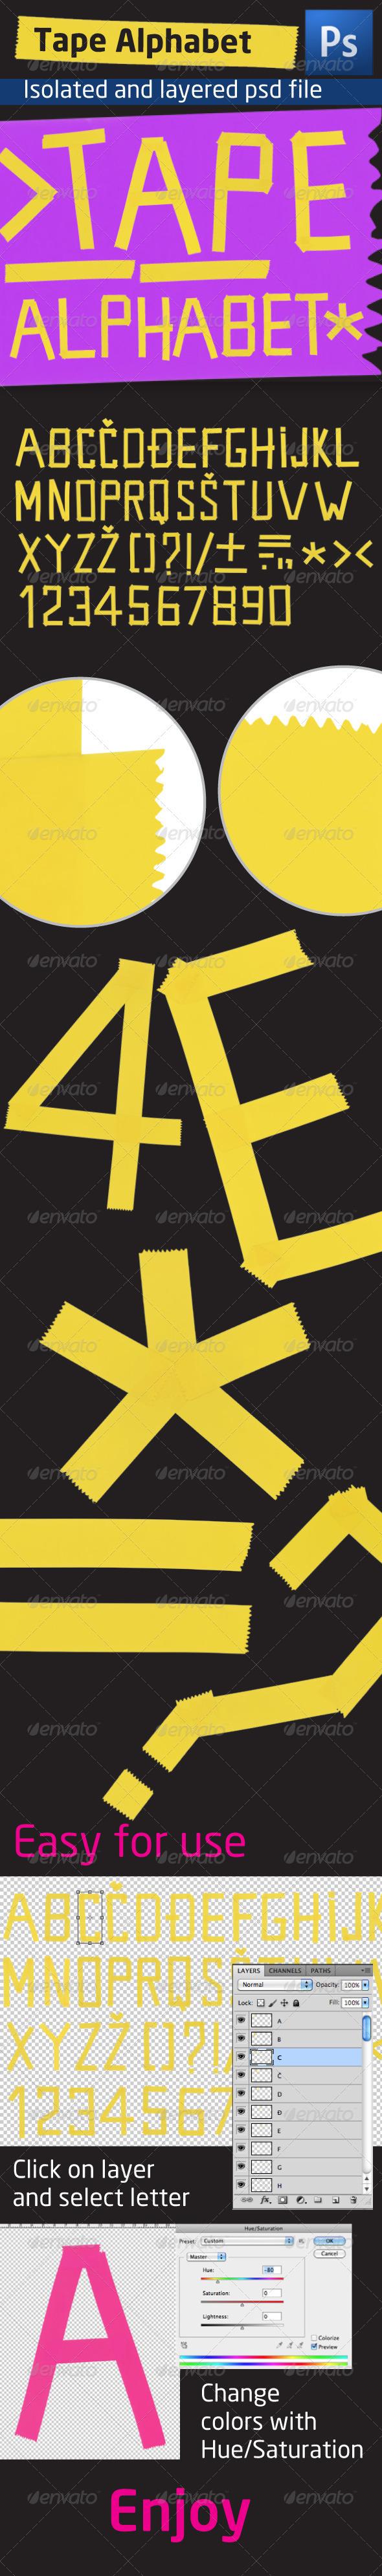 Tape Alphabet - Miscellaneous Backgrounds